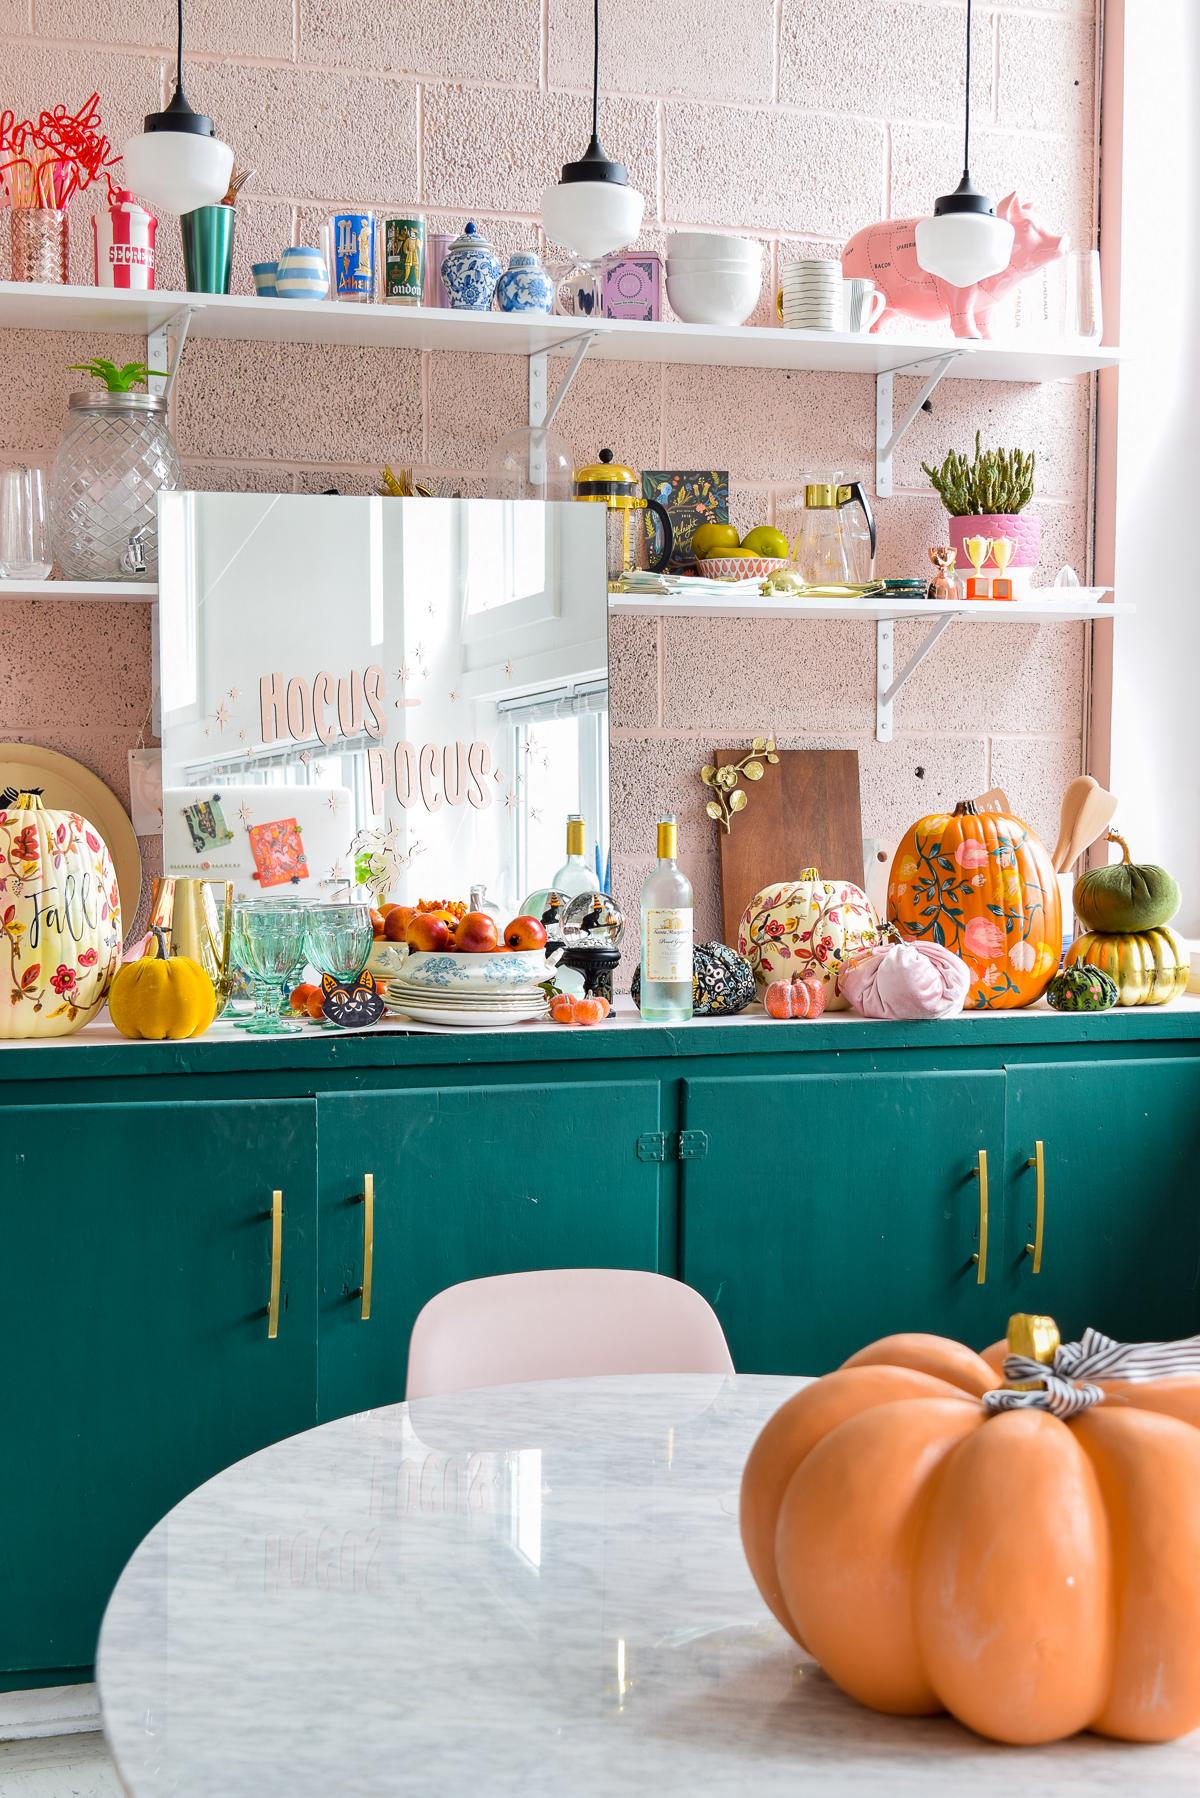 colourful fall decor in a kitchen